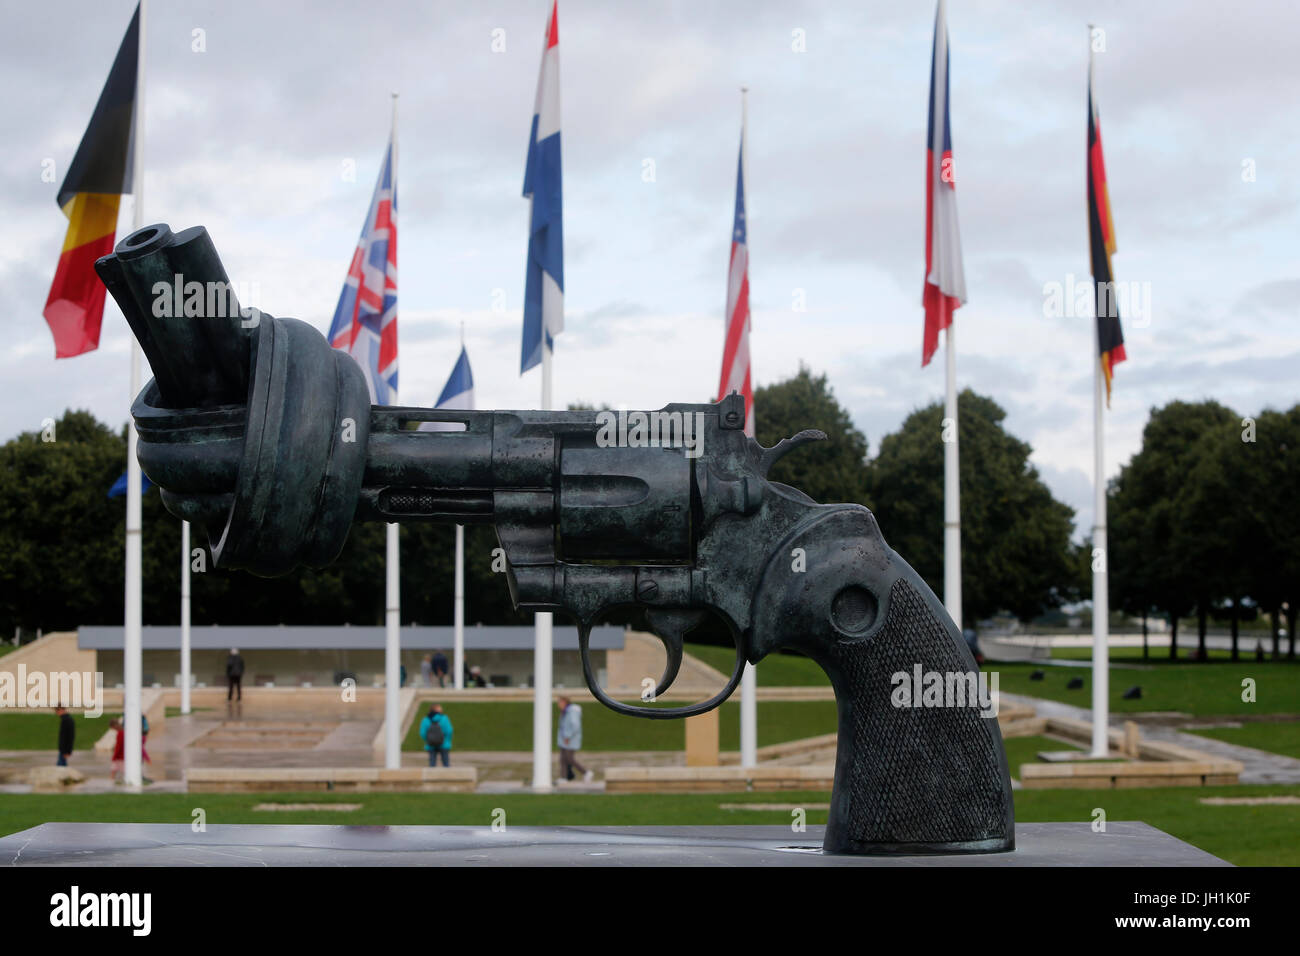 Bronze sculpture outside the Memorial de la Paix in Caen : Non violence - the knotted gun, by Carl Fredrik Reutersward. - Stock Image